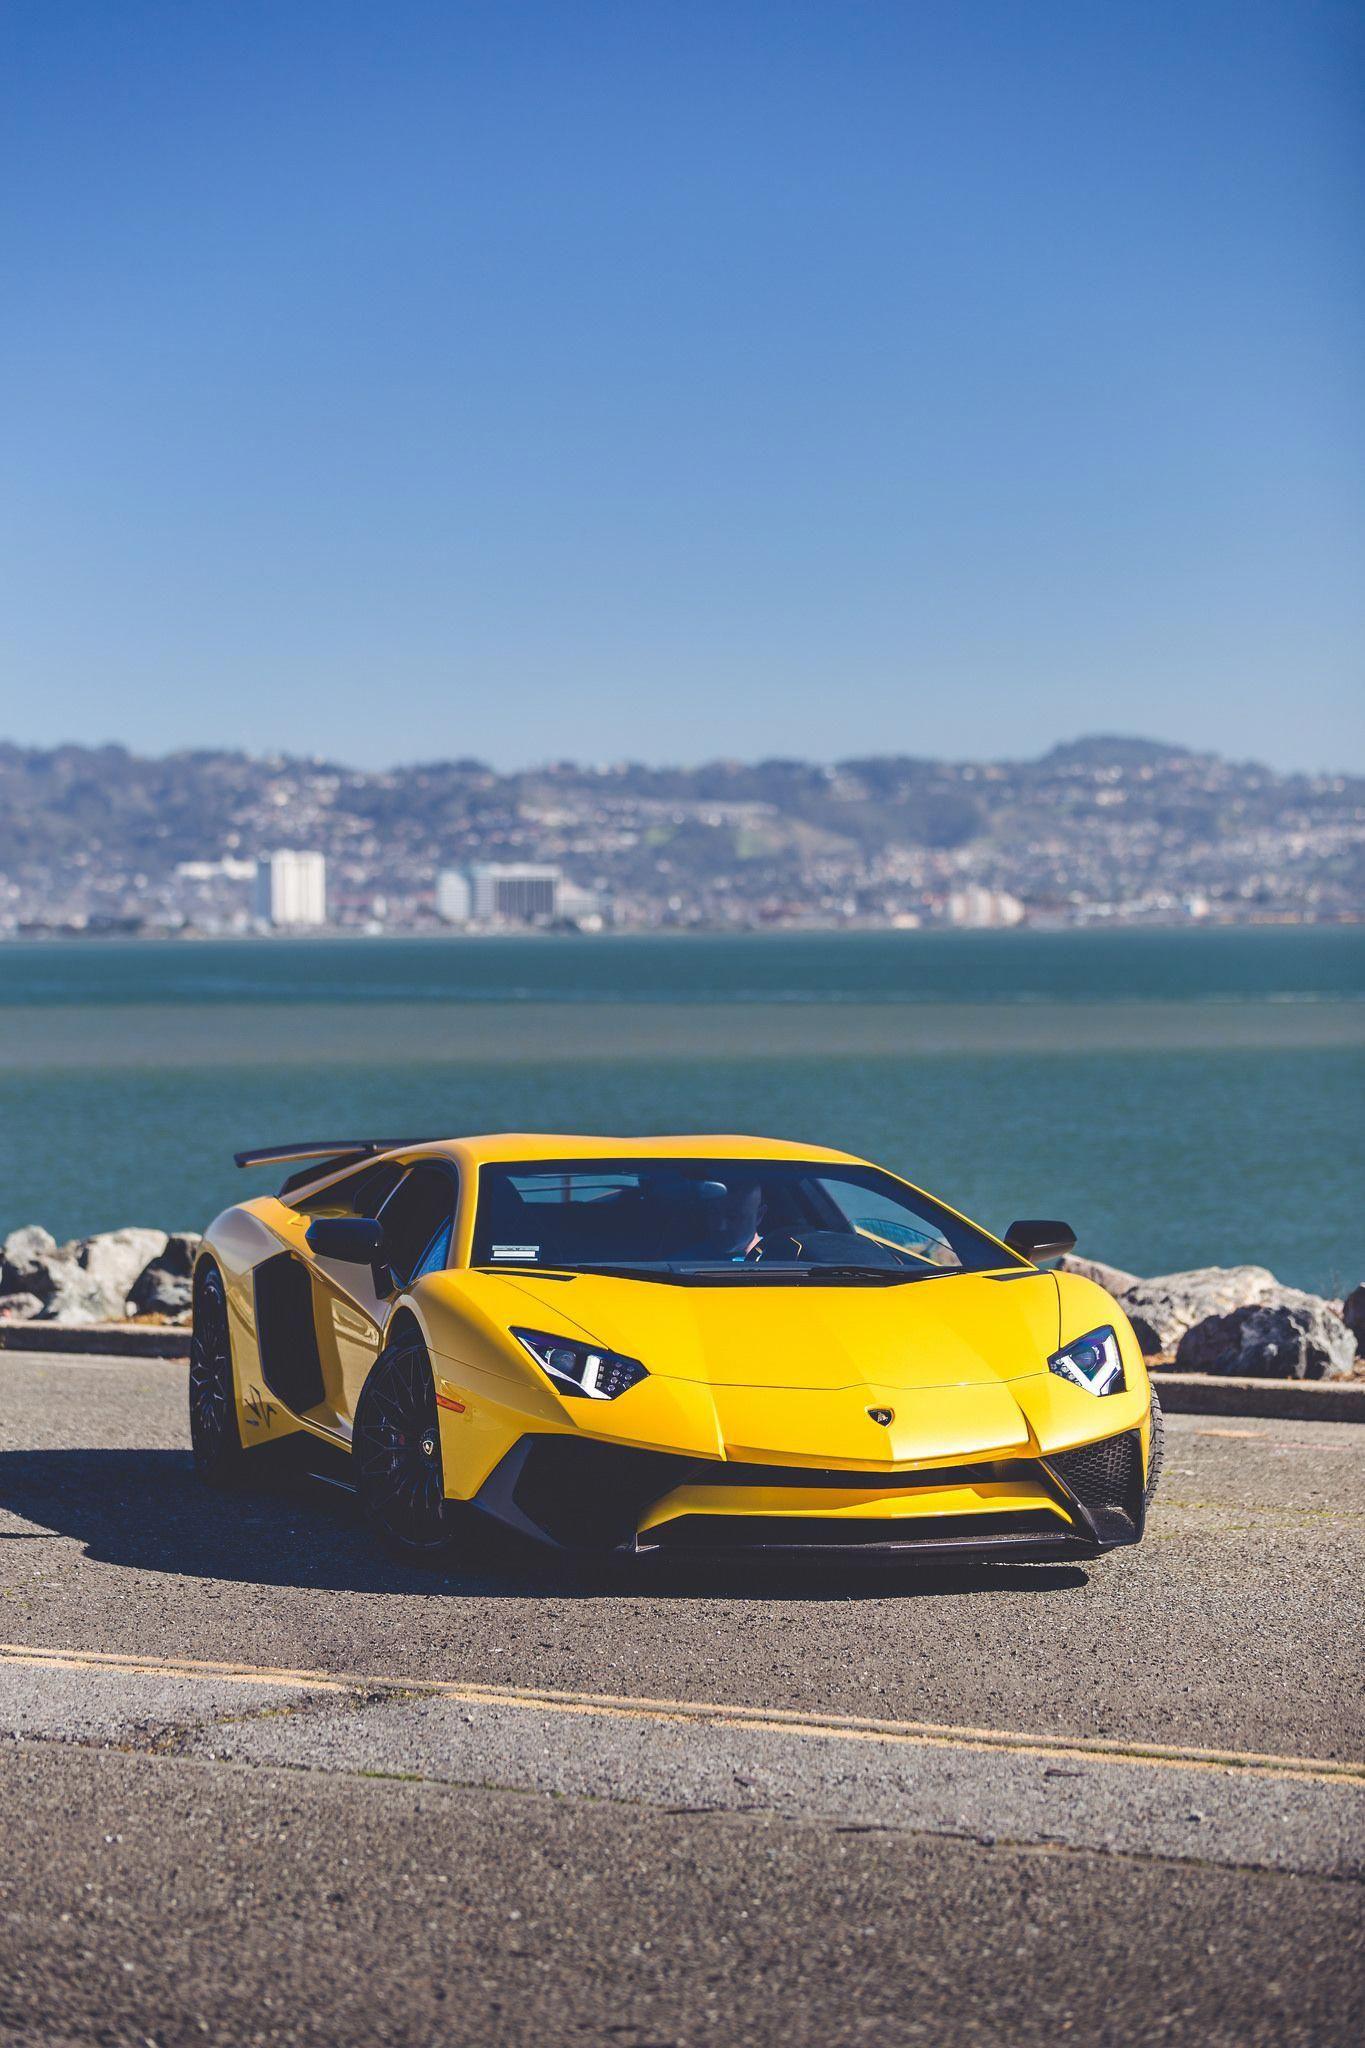 This Keyword Is My Most Desired Vehicle So Fantastic Lamborghini Lamborghini Aventador Sports Cars Luxury Lamborghini Veneno